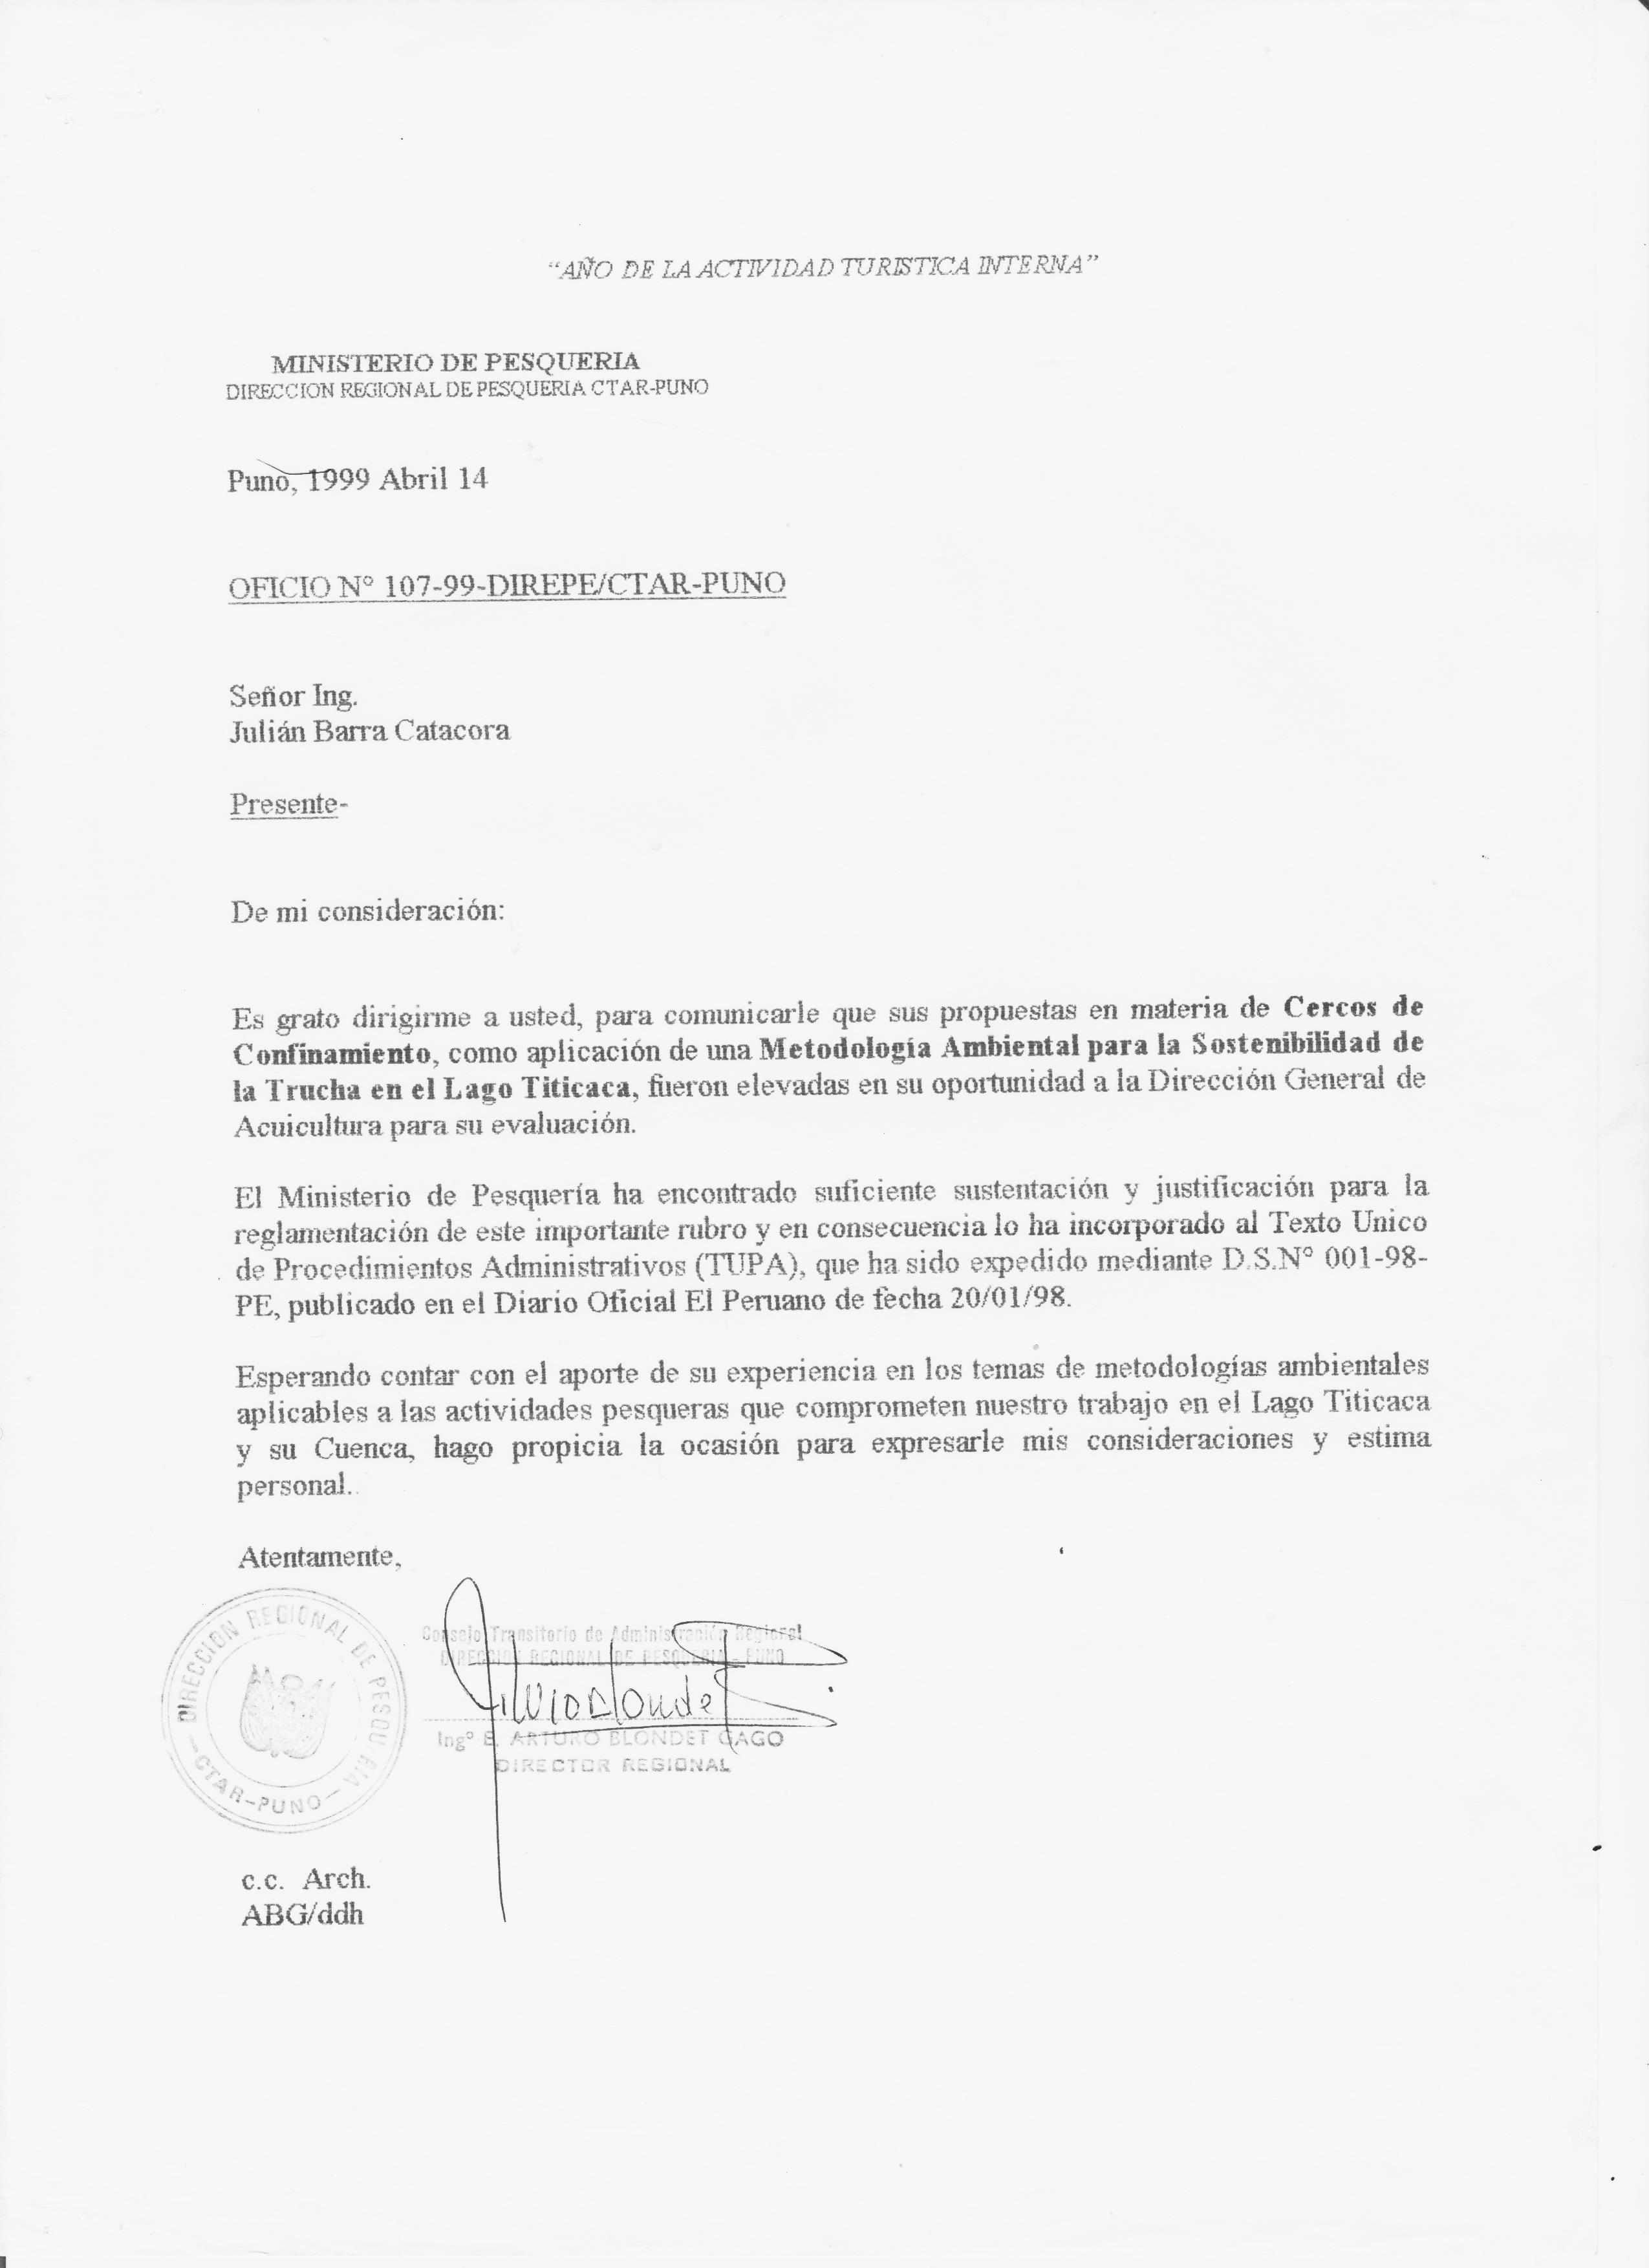 Curriculum - Ing. Julián Barra Catacora